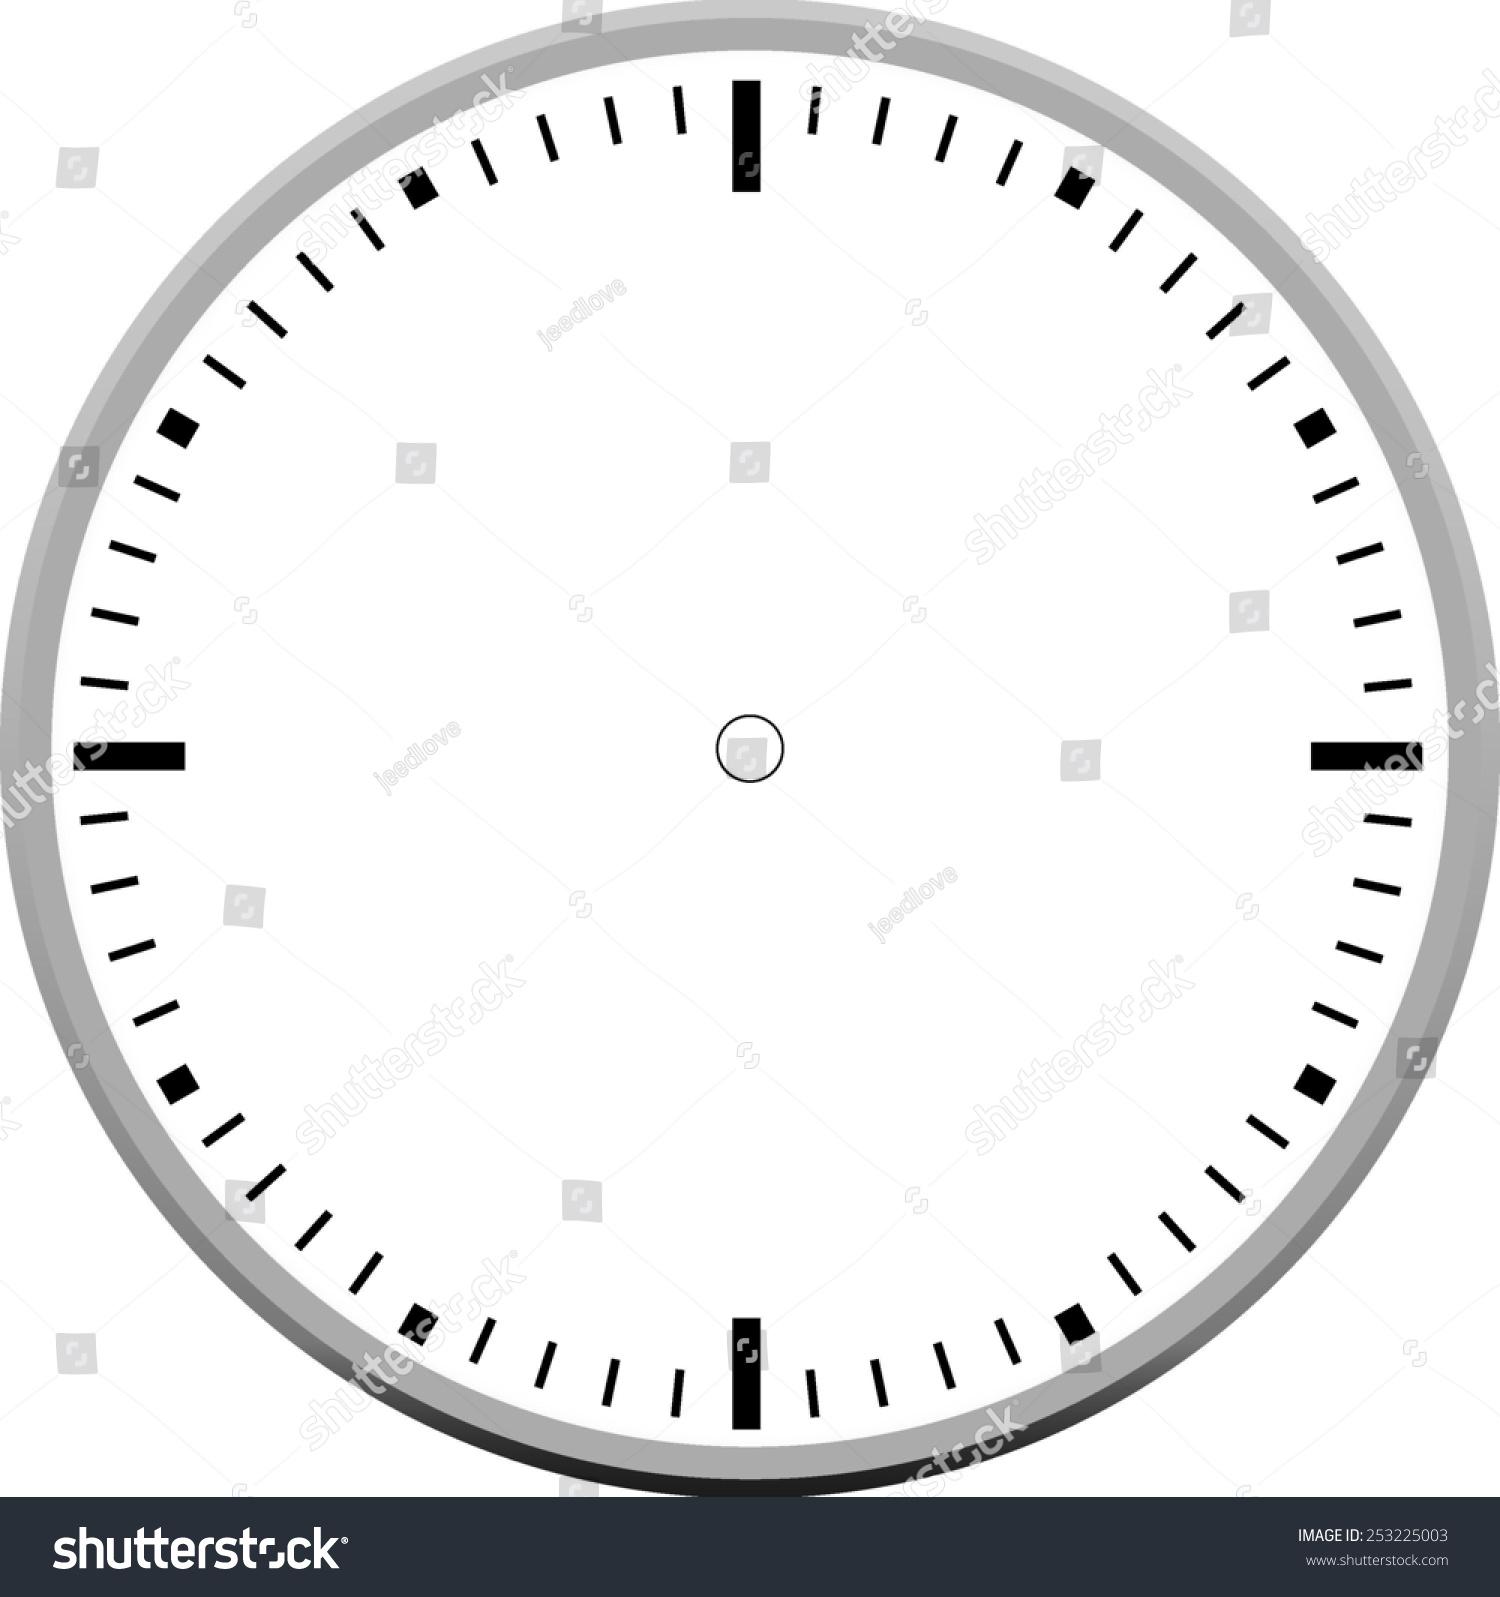 worksheet Clock Blank clock face blank stock vector 253225003 shutterstock blank